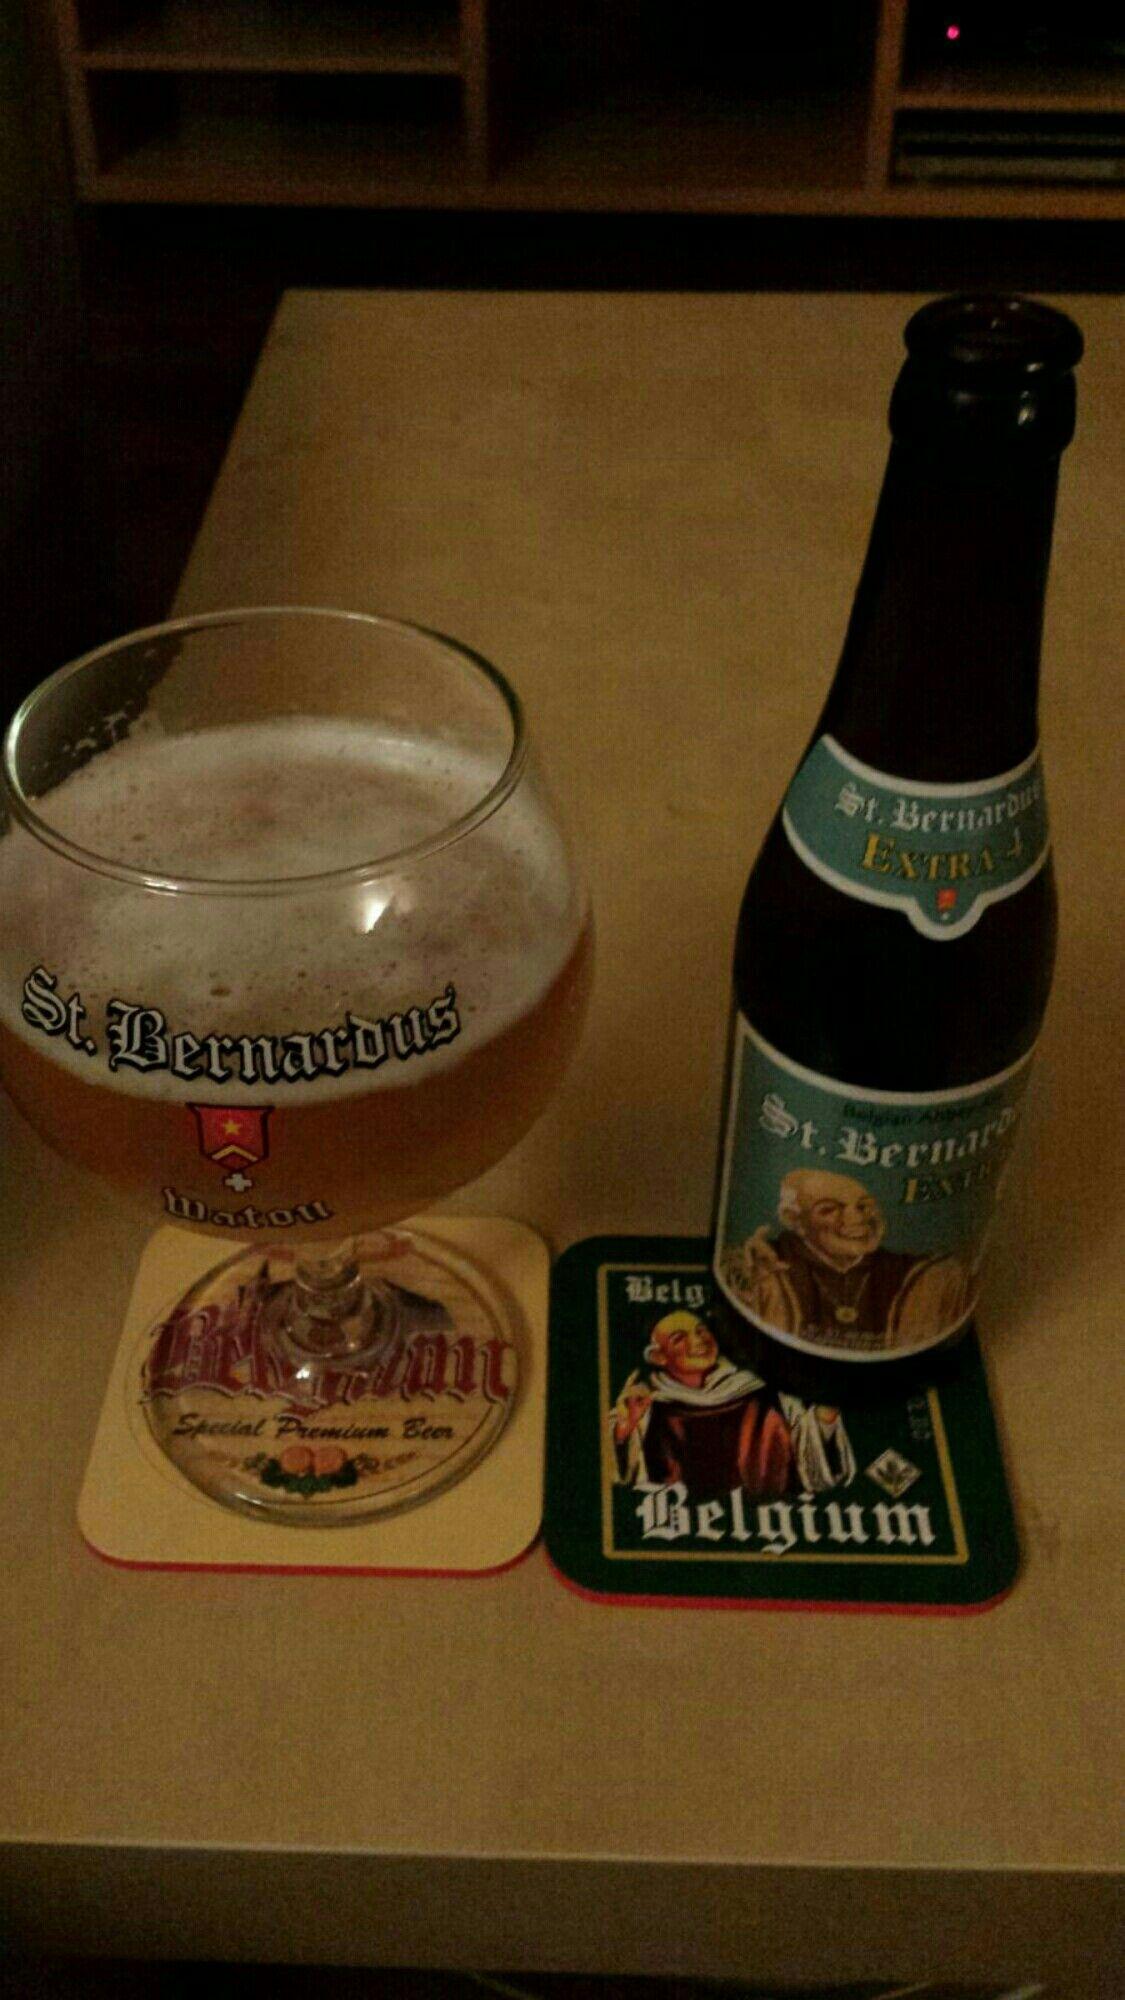 St. Bernardus 4